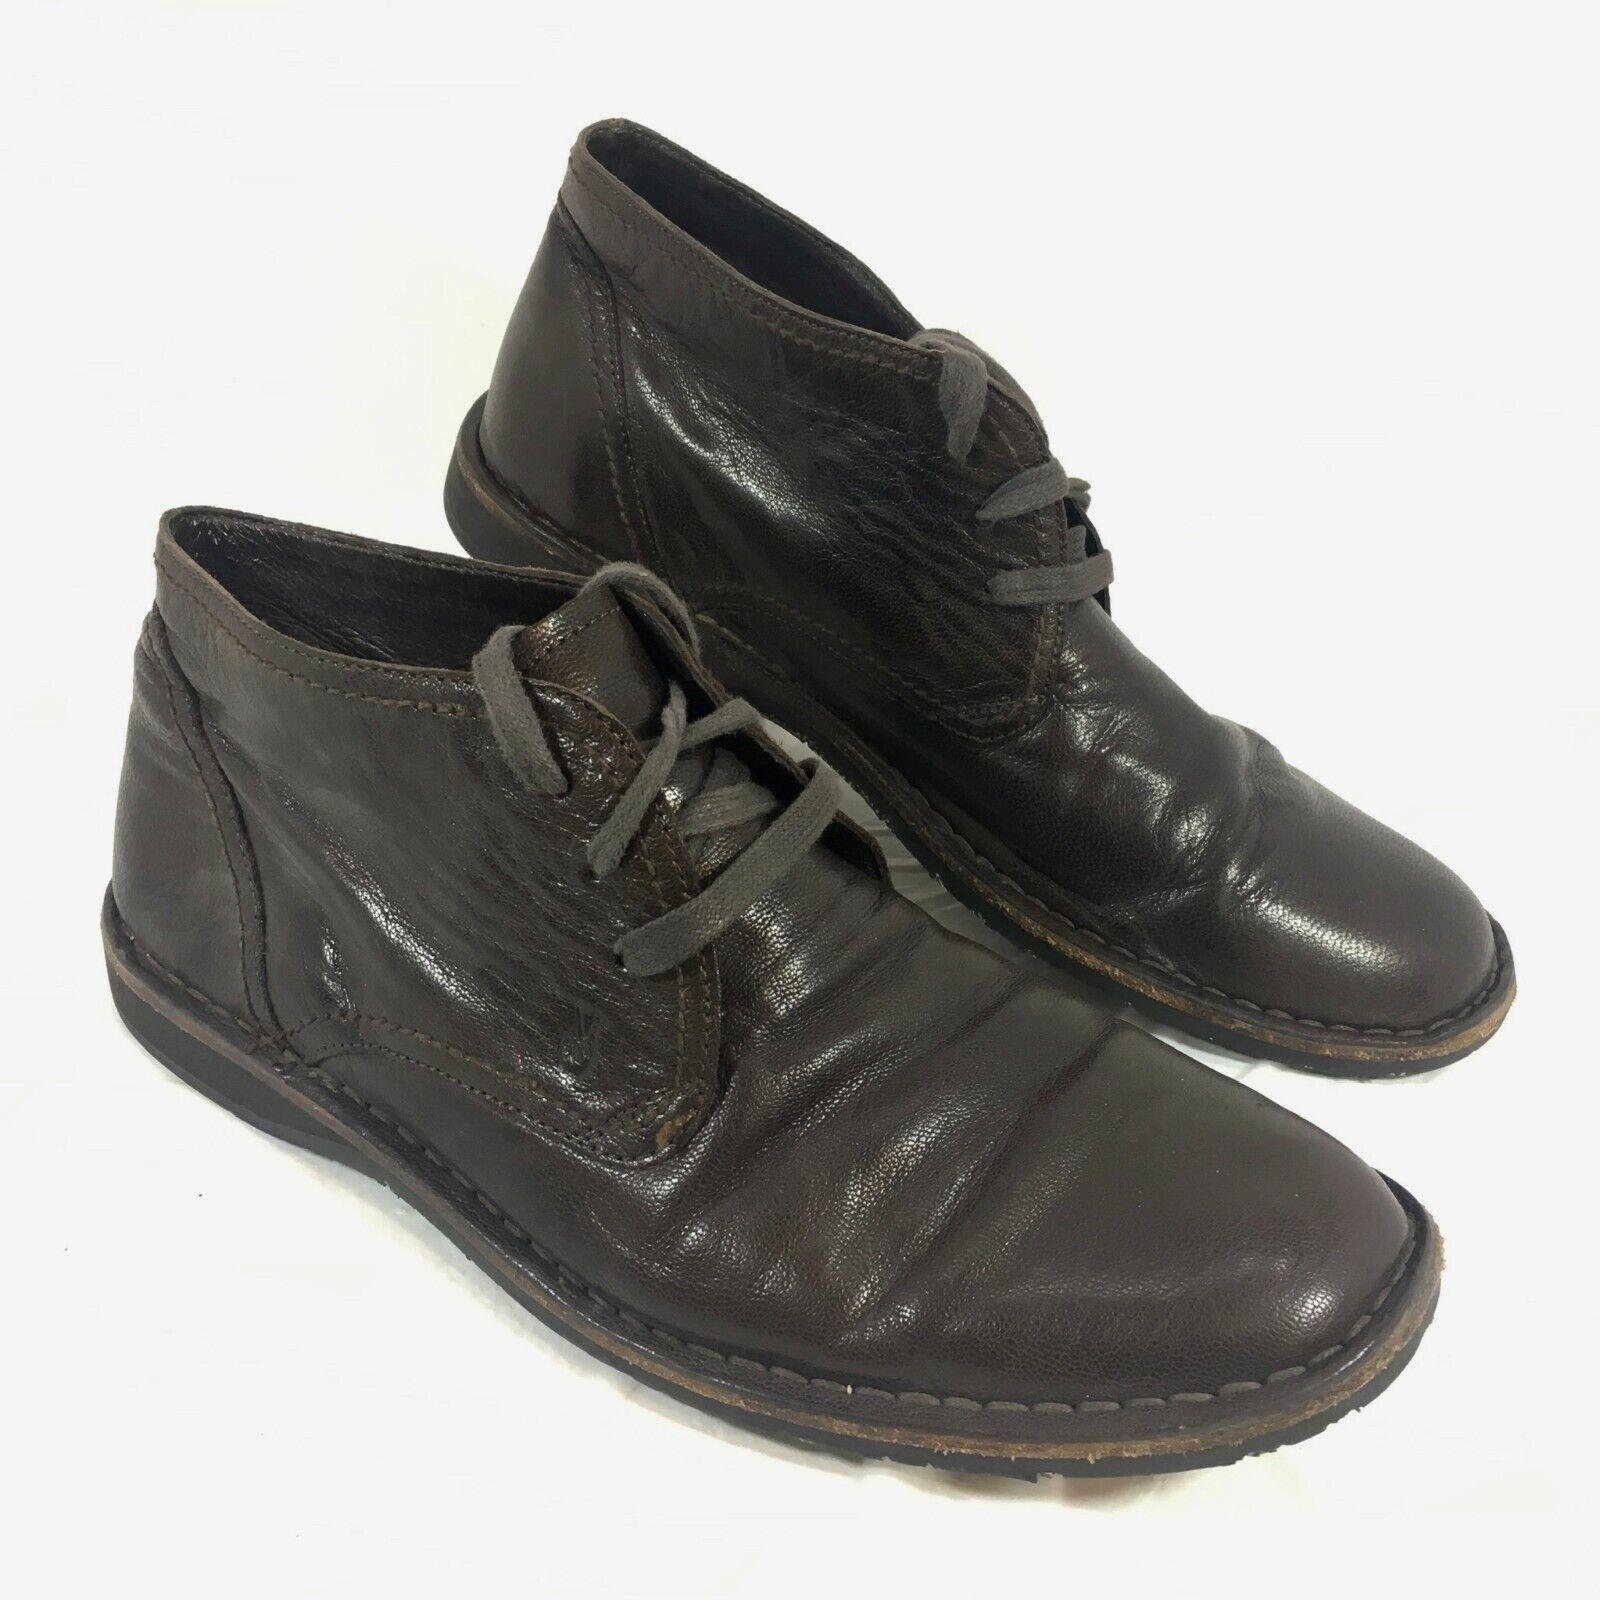 GUC Men's John Varvatos Brown Leather low Ankle Boots Sz 10 M